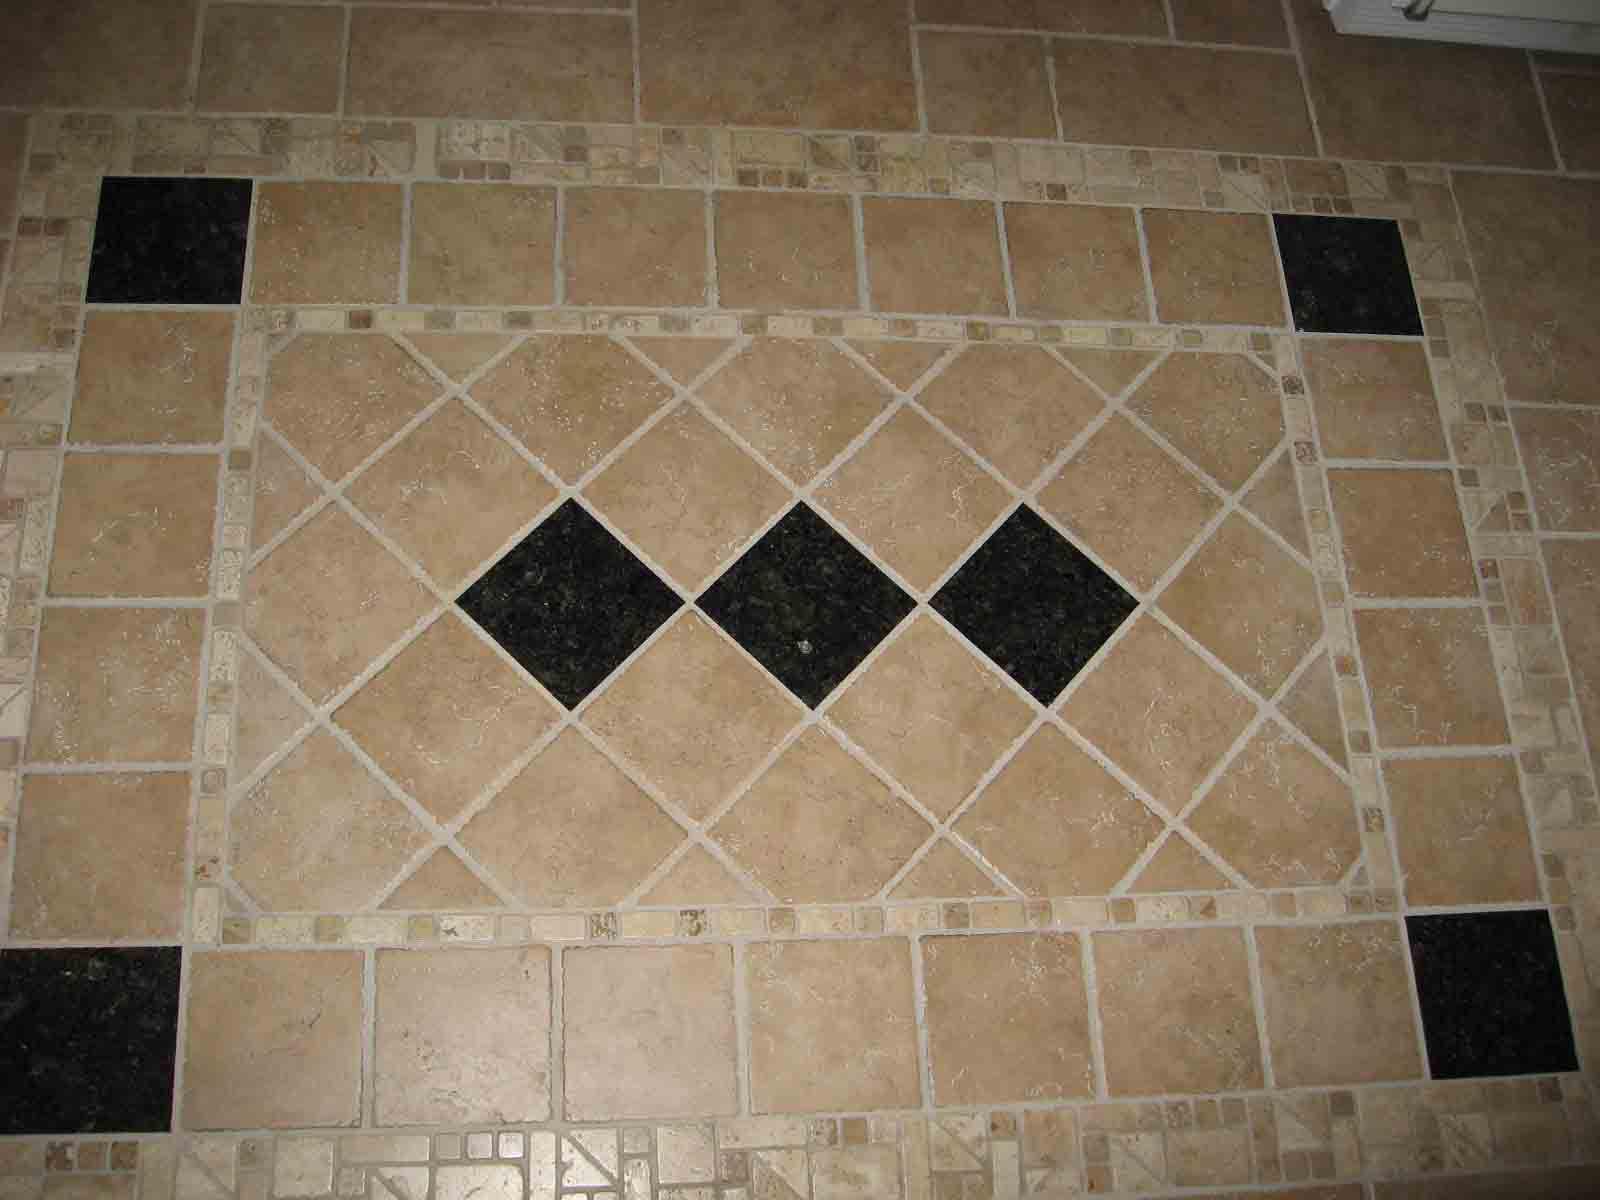 Foyer Tile Design Ideas 81 terrific shower tile design ideas home Google Image Result For Httpnordiccraftsmencomimagestile